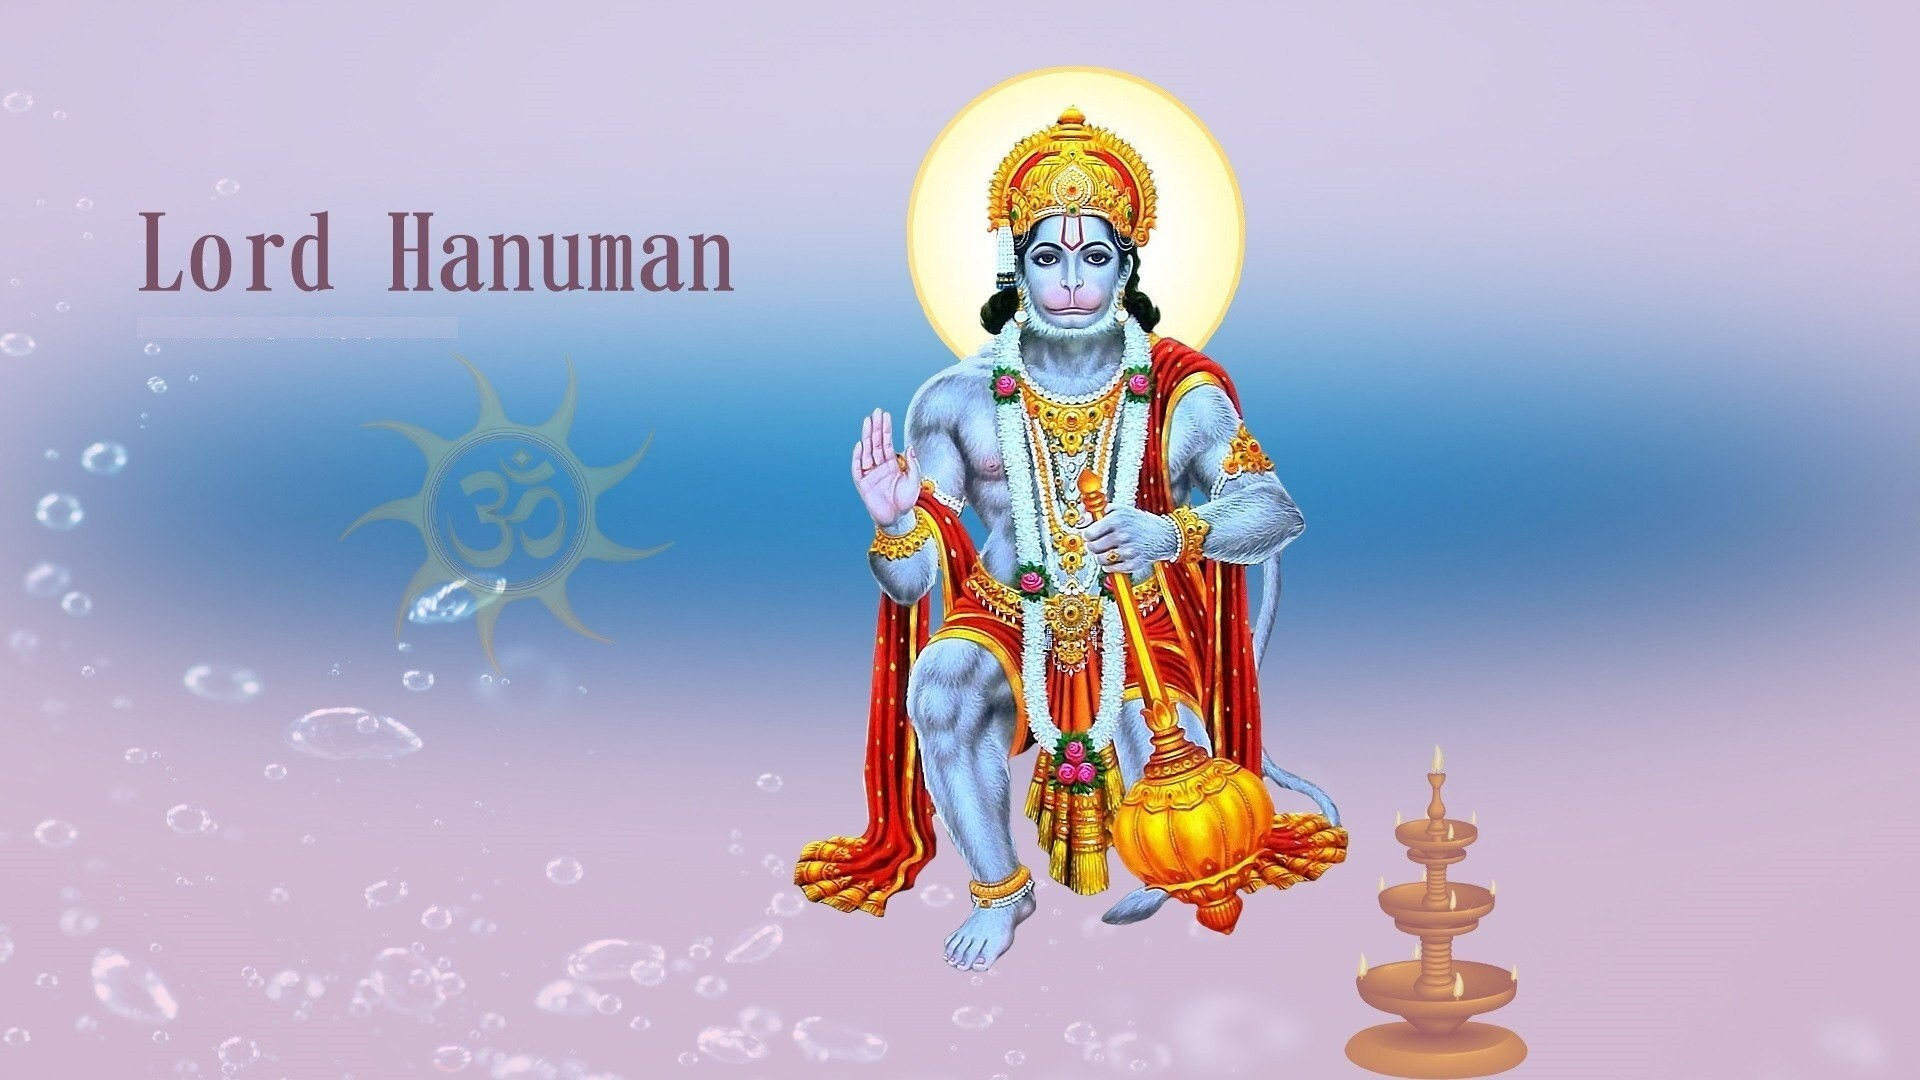 Photo Of Lord Hanuman Hd Wallpapers